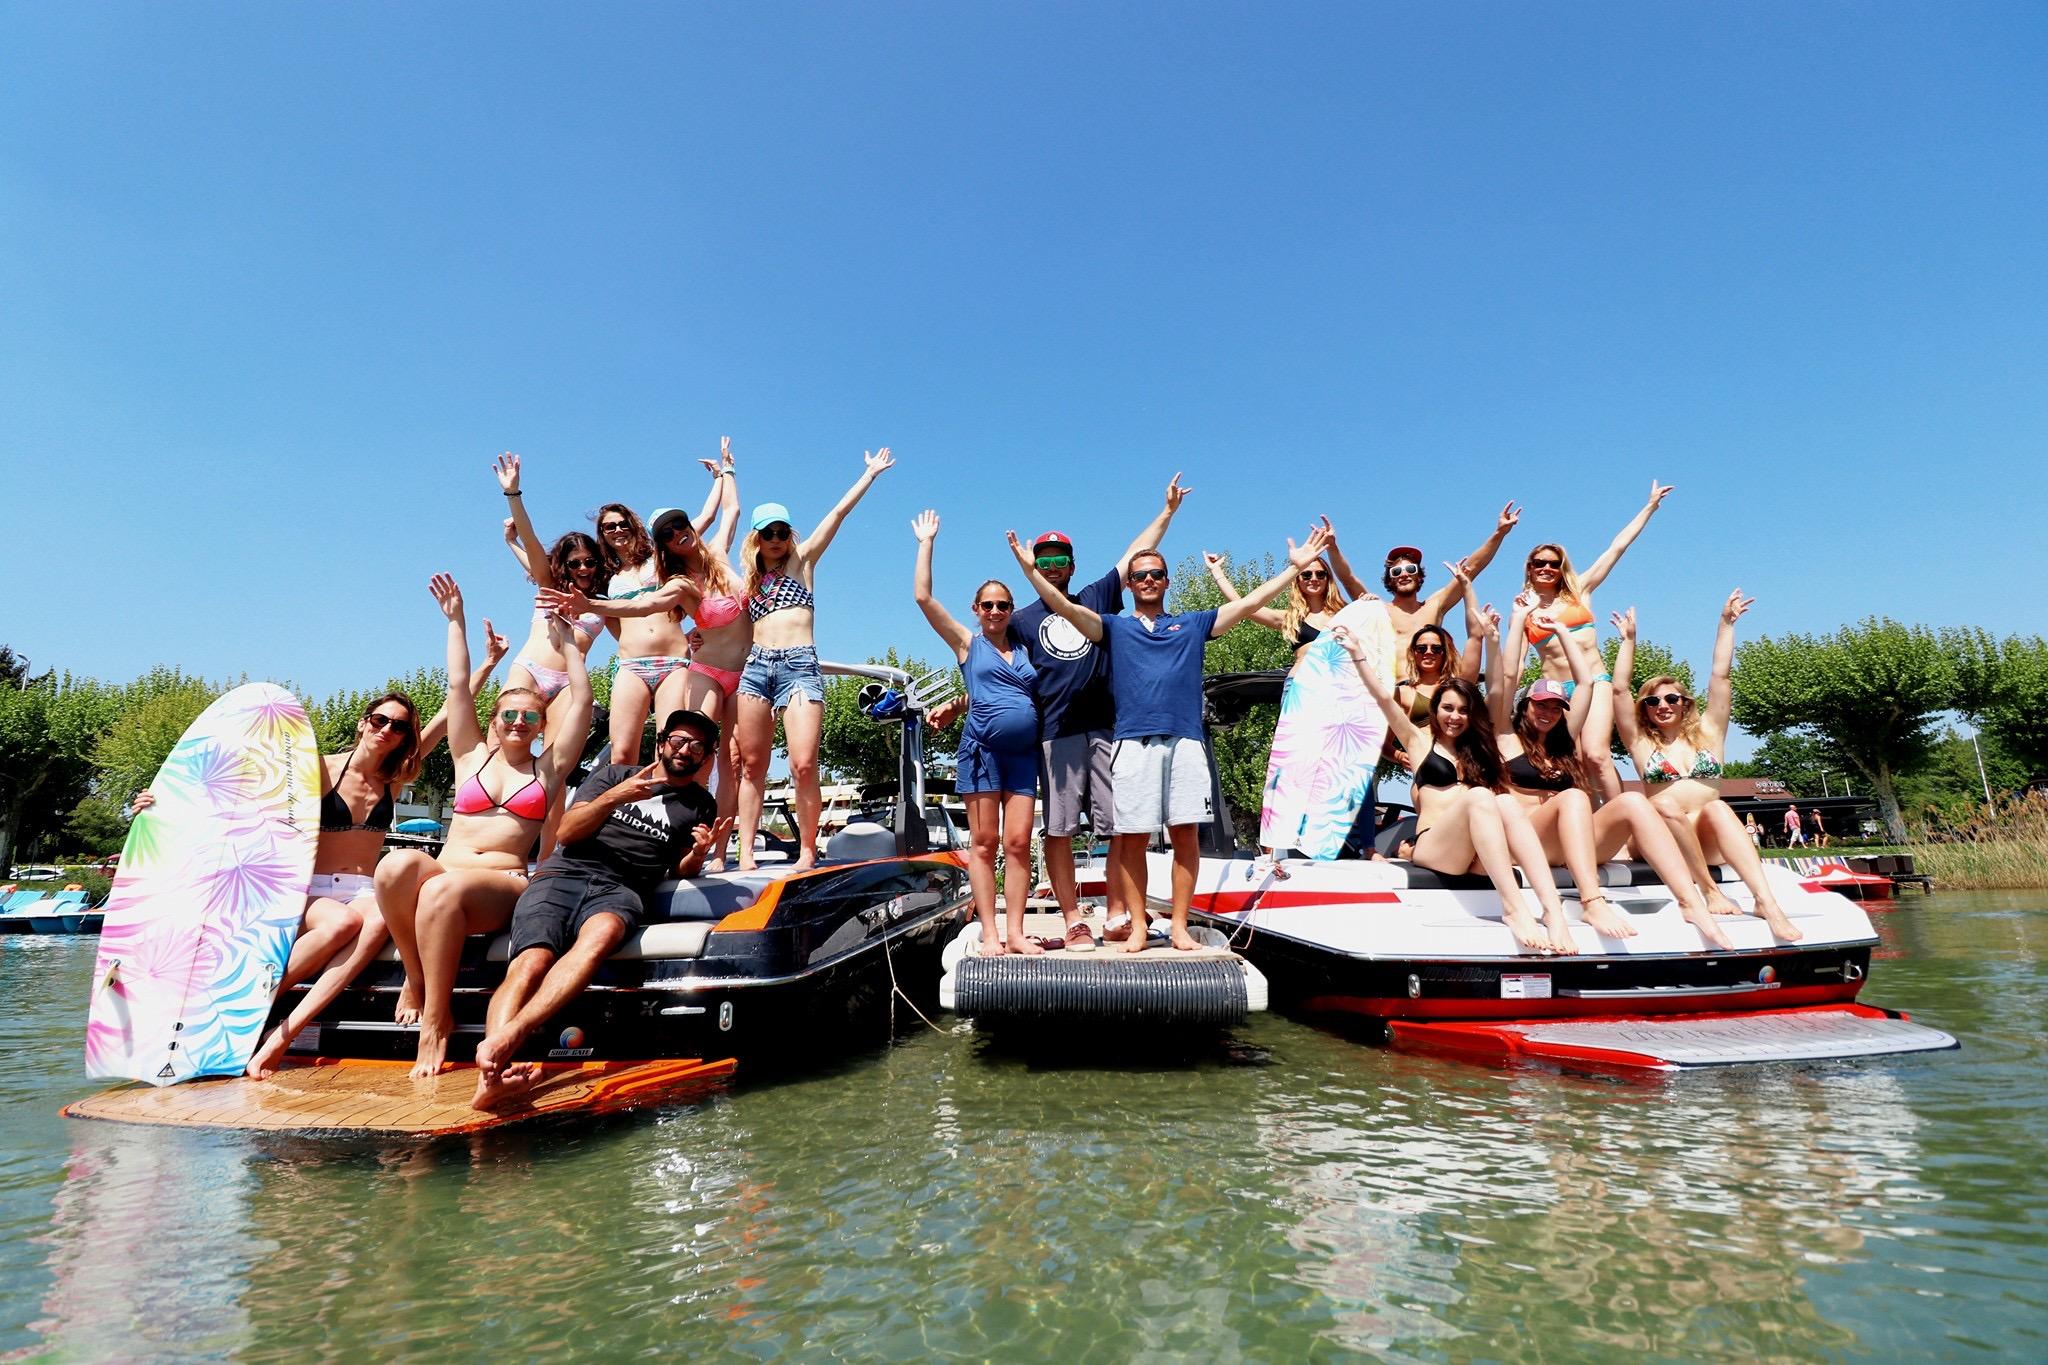 sport-montagne-surf-eau-wakeboard-femmes-filles-glisse-lac-sportives-amies-annecy-wetsuit-ripcurl